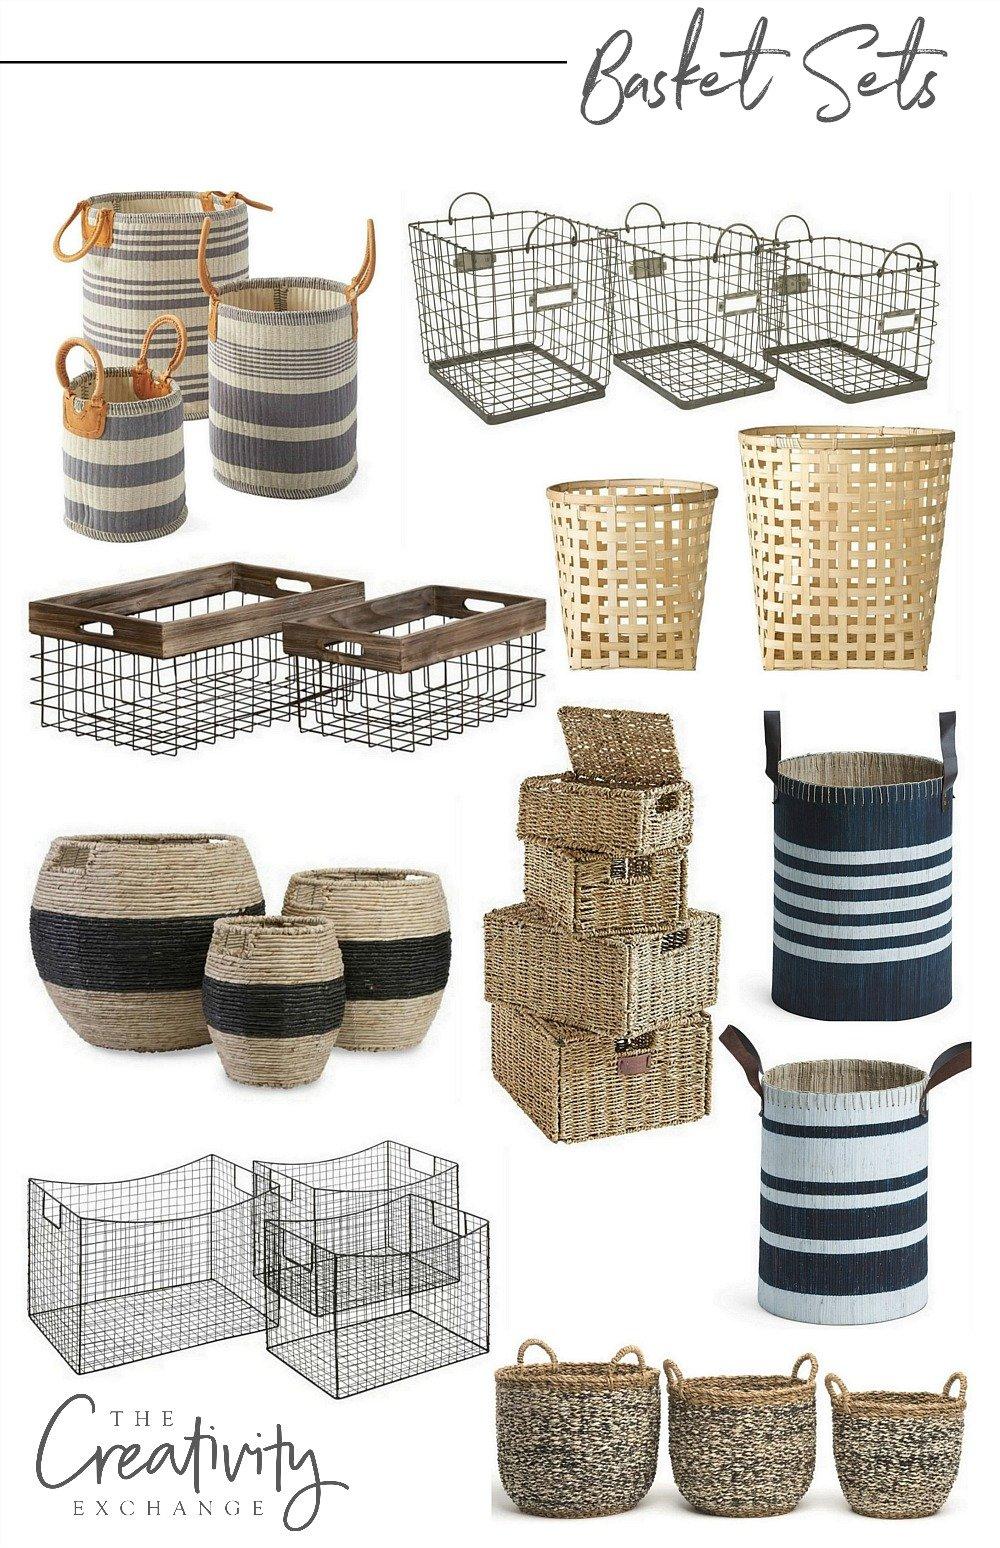 Beautiful basket sets for organizing